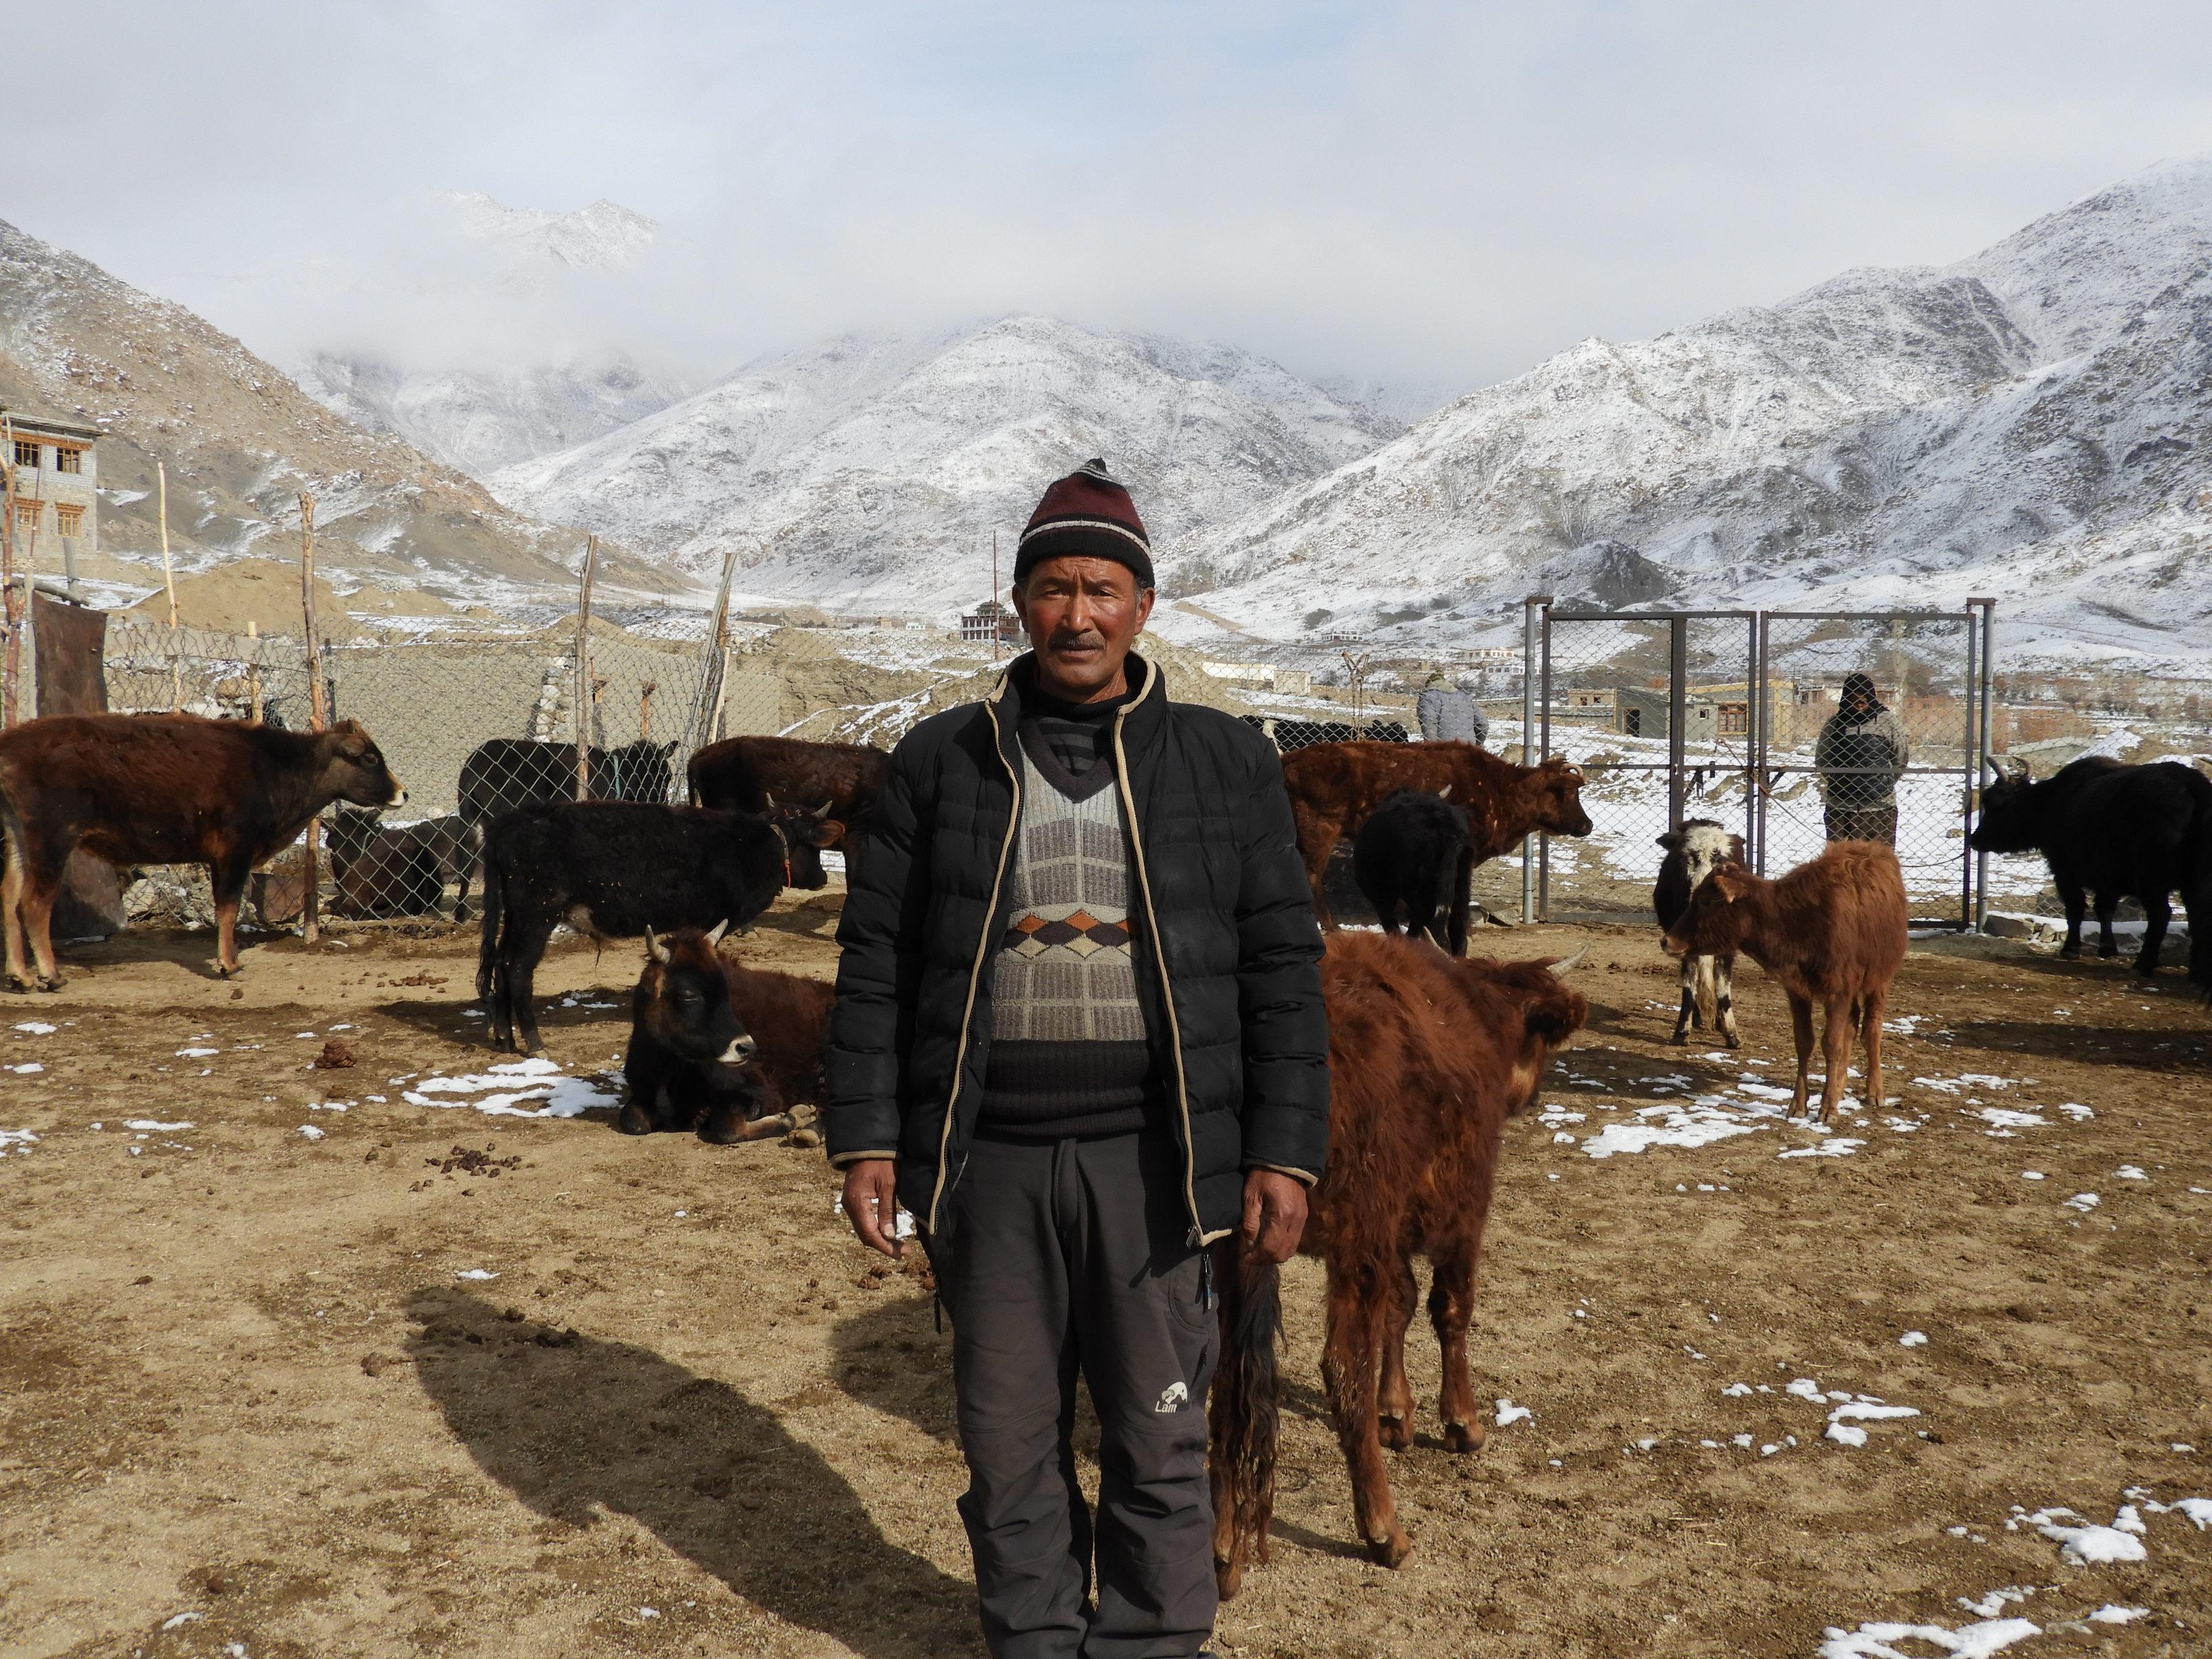 Tsering Dorjay with his animals. (Source: Rinchen Angmo/Reach Ladakh)